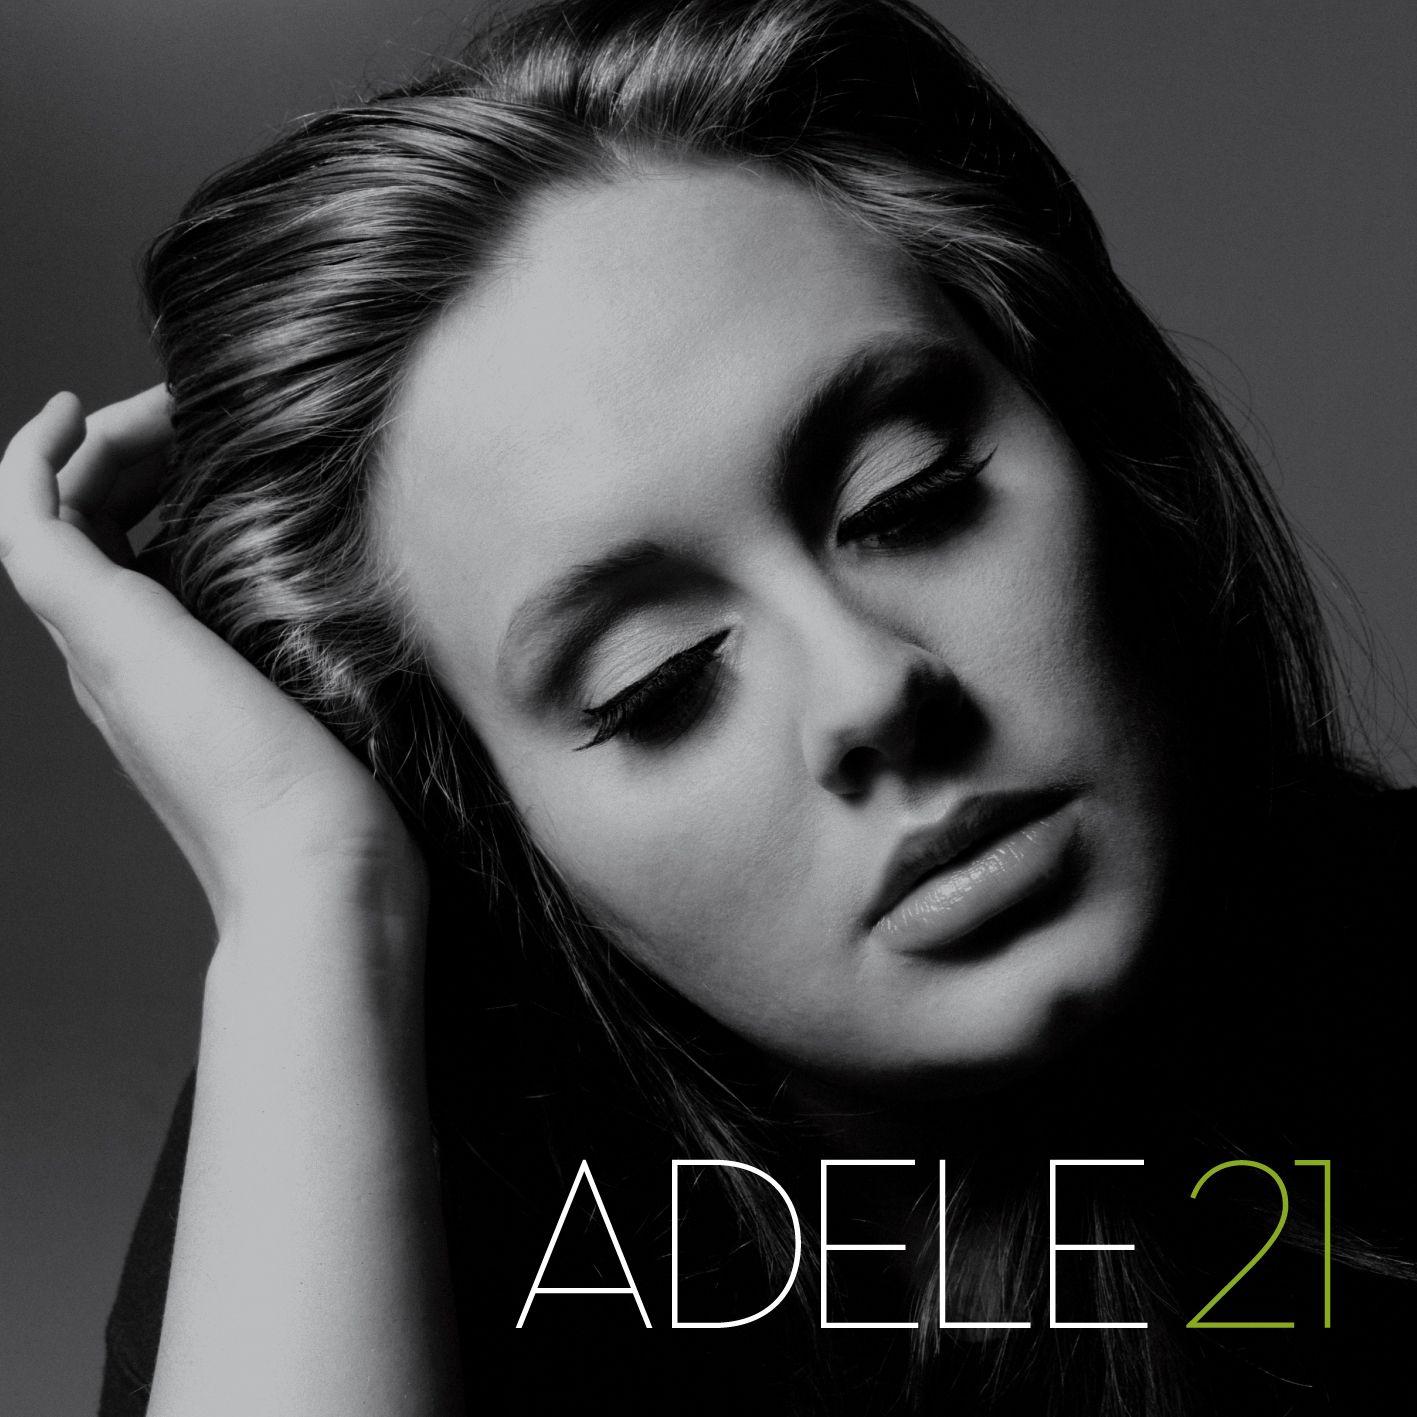 One the Best Album